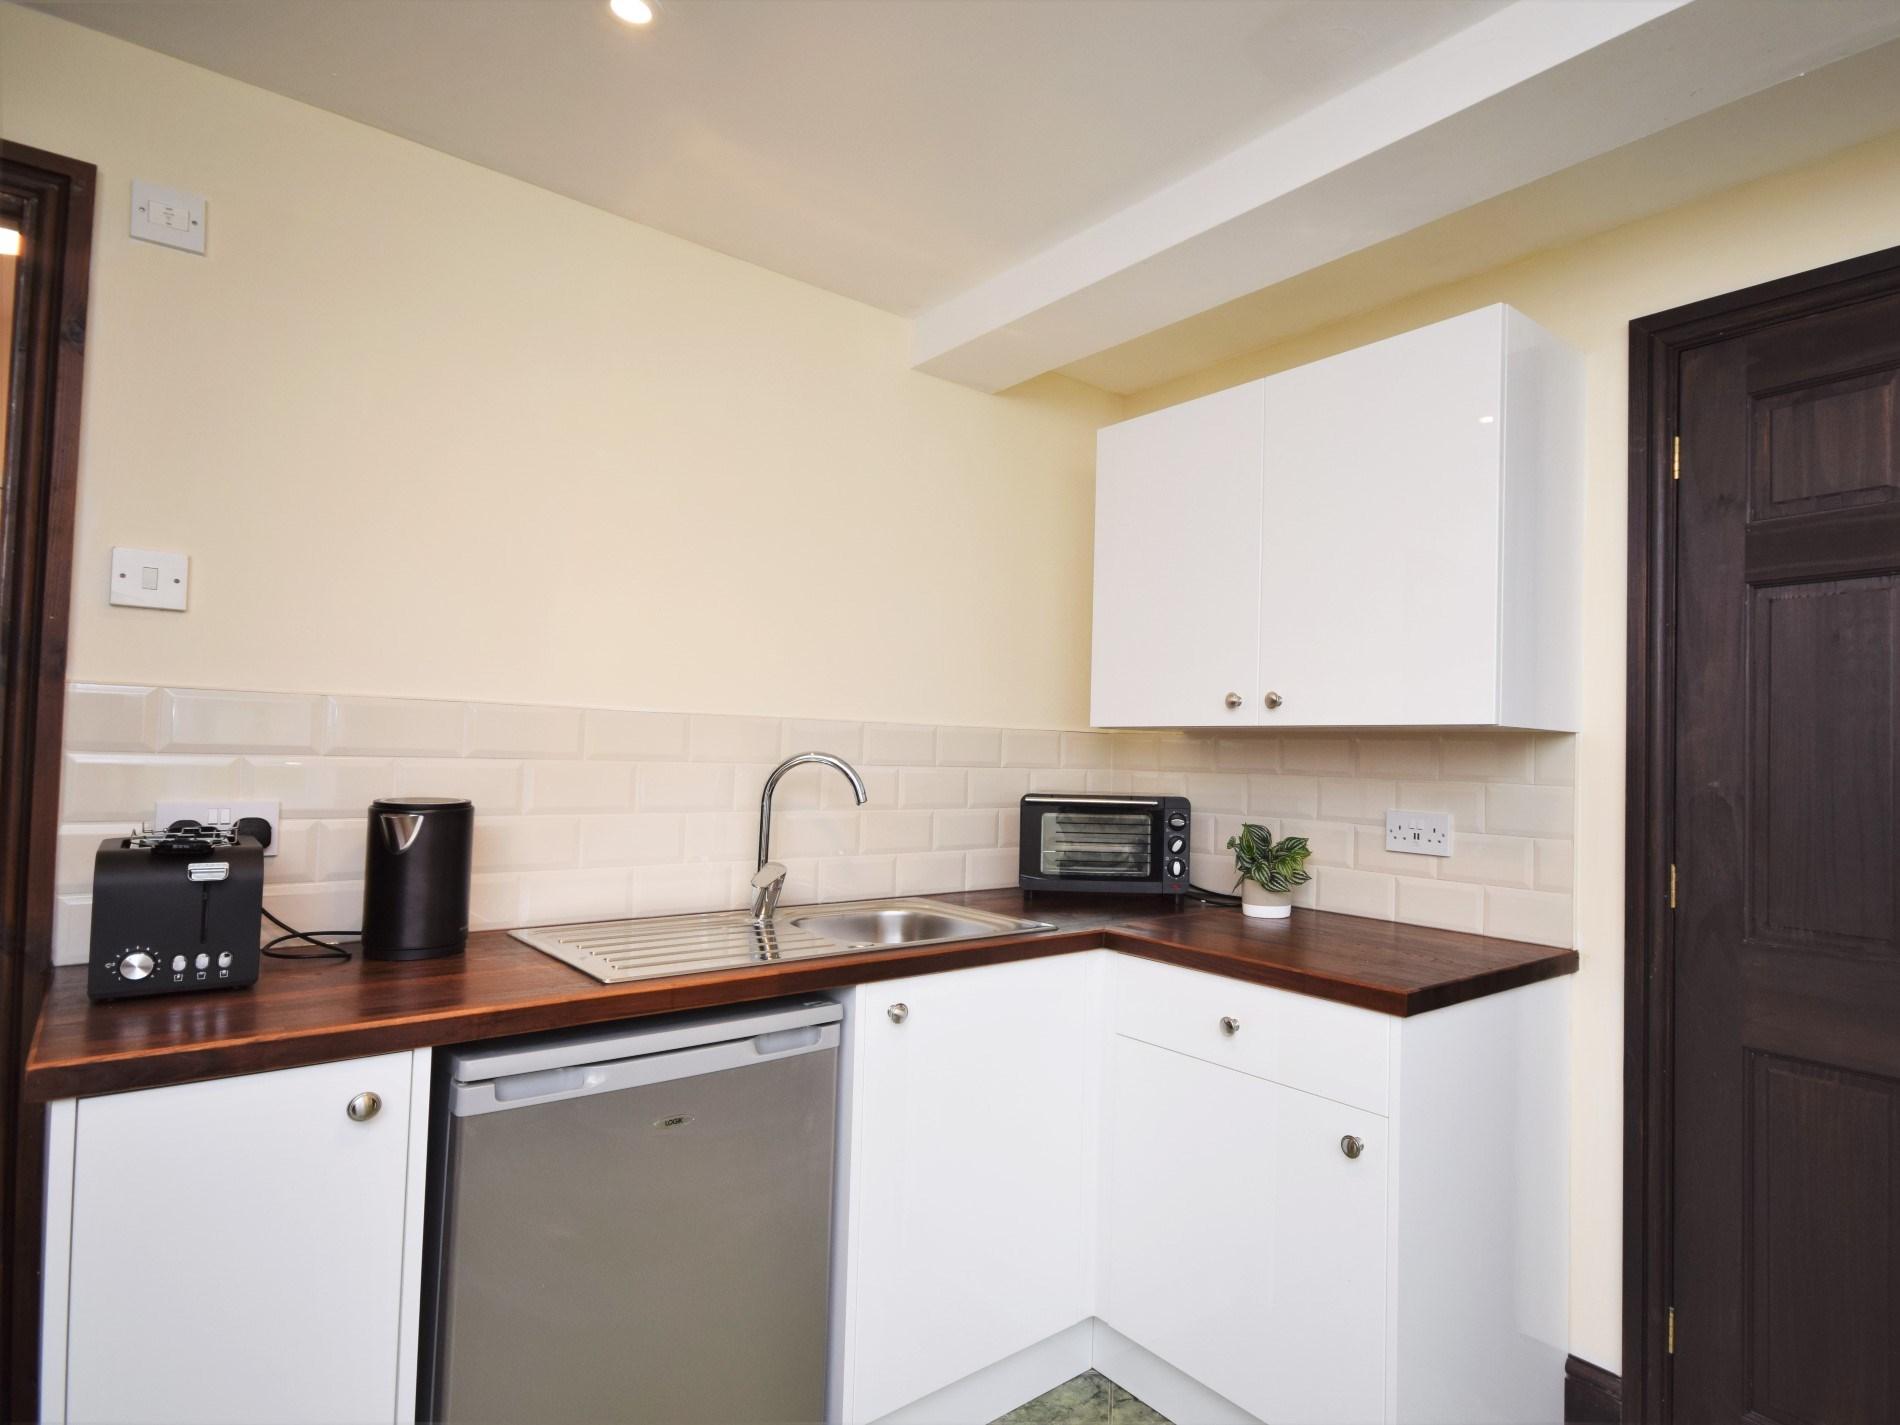 4 Bedroom House in North Devon, Devon